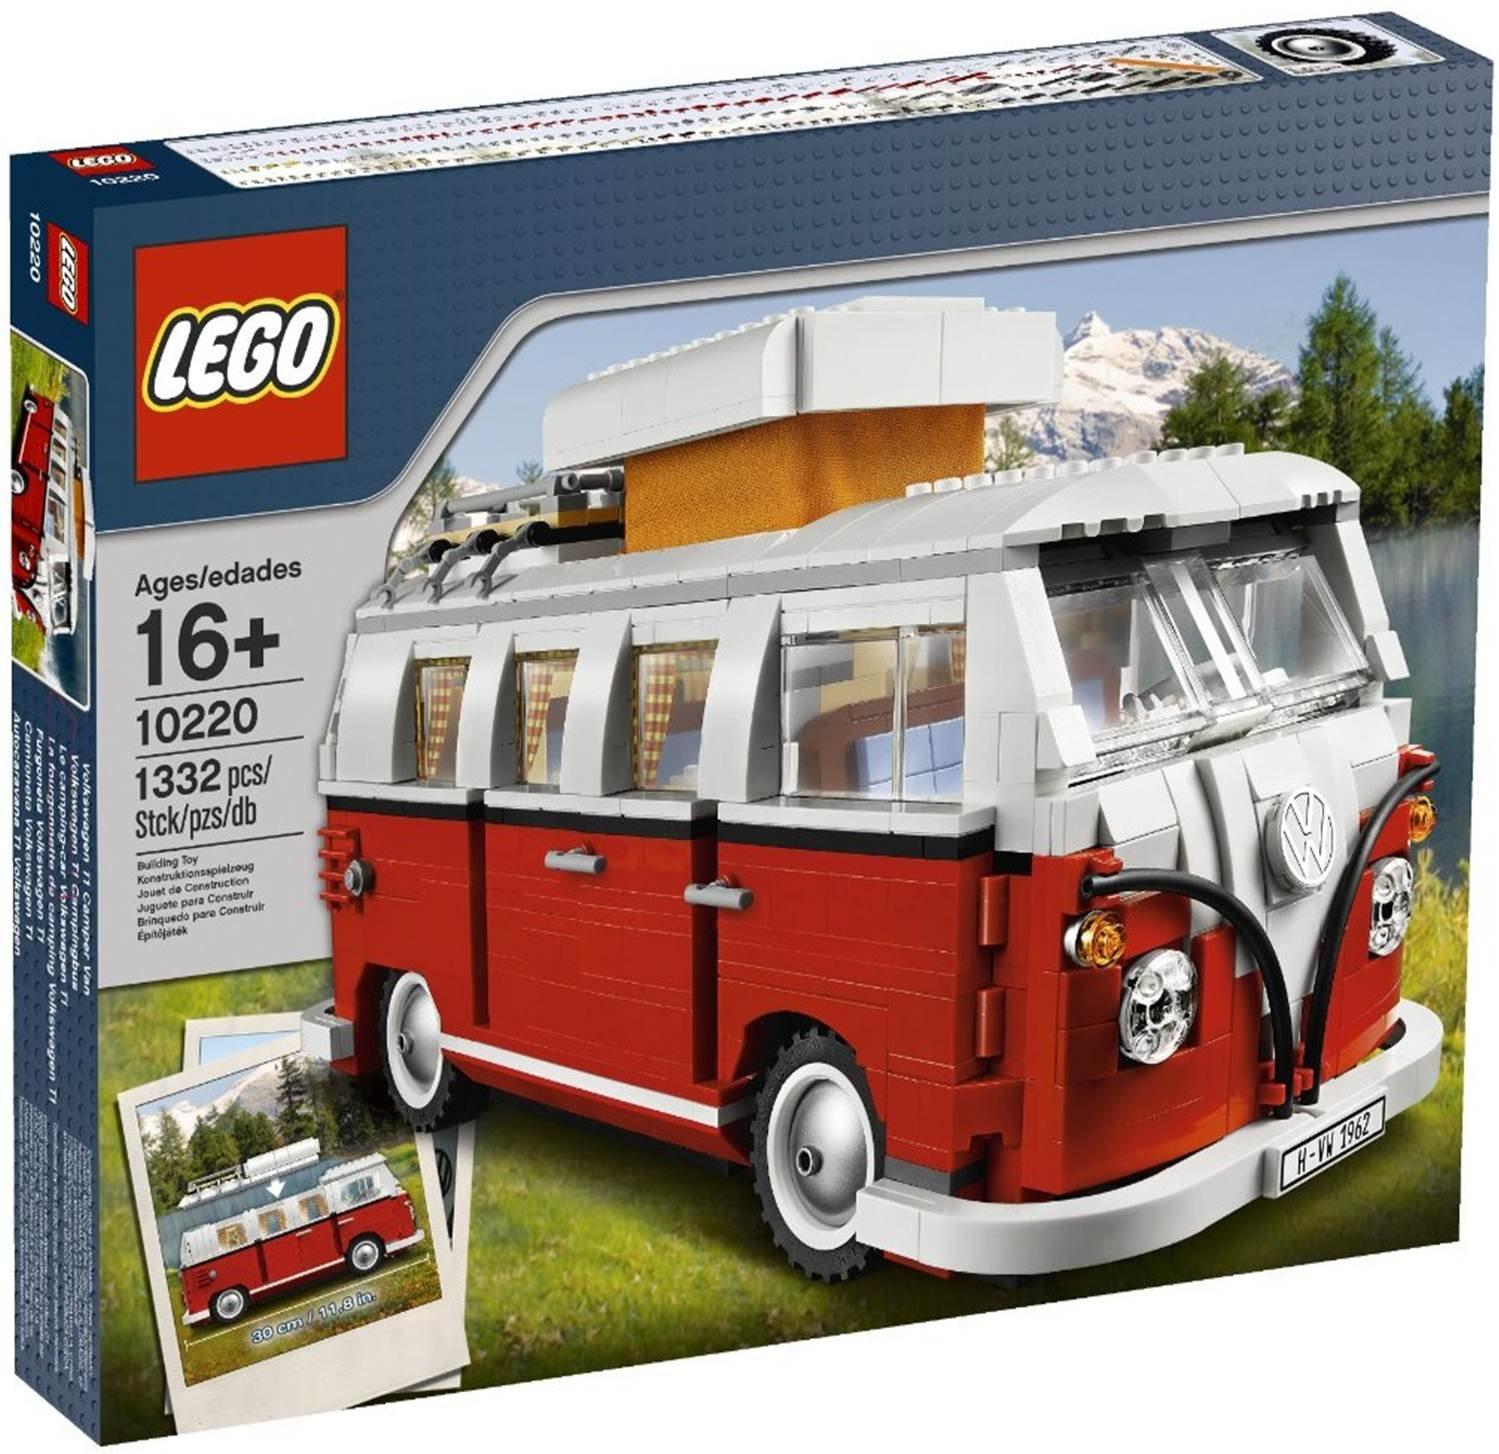 Volkswagen 211099320 BL9 Lego-Bus